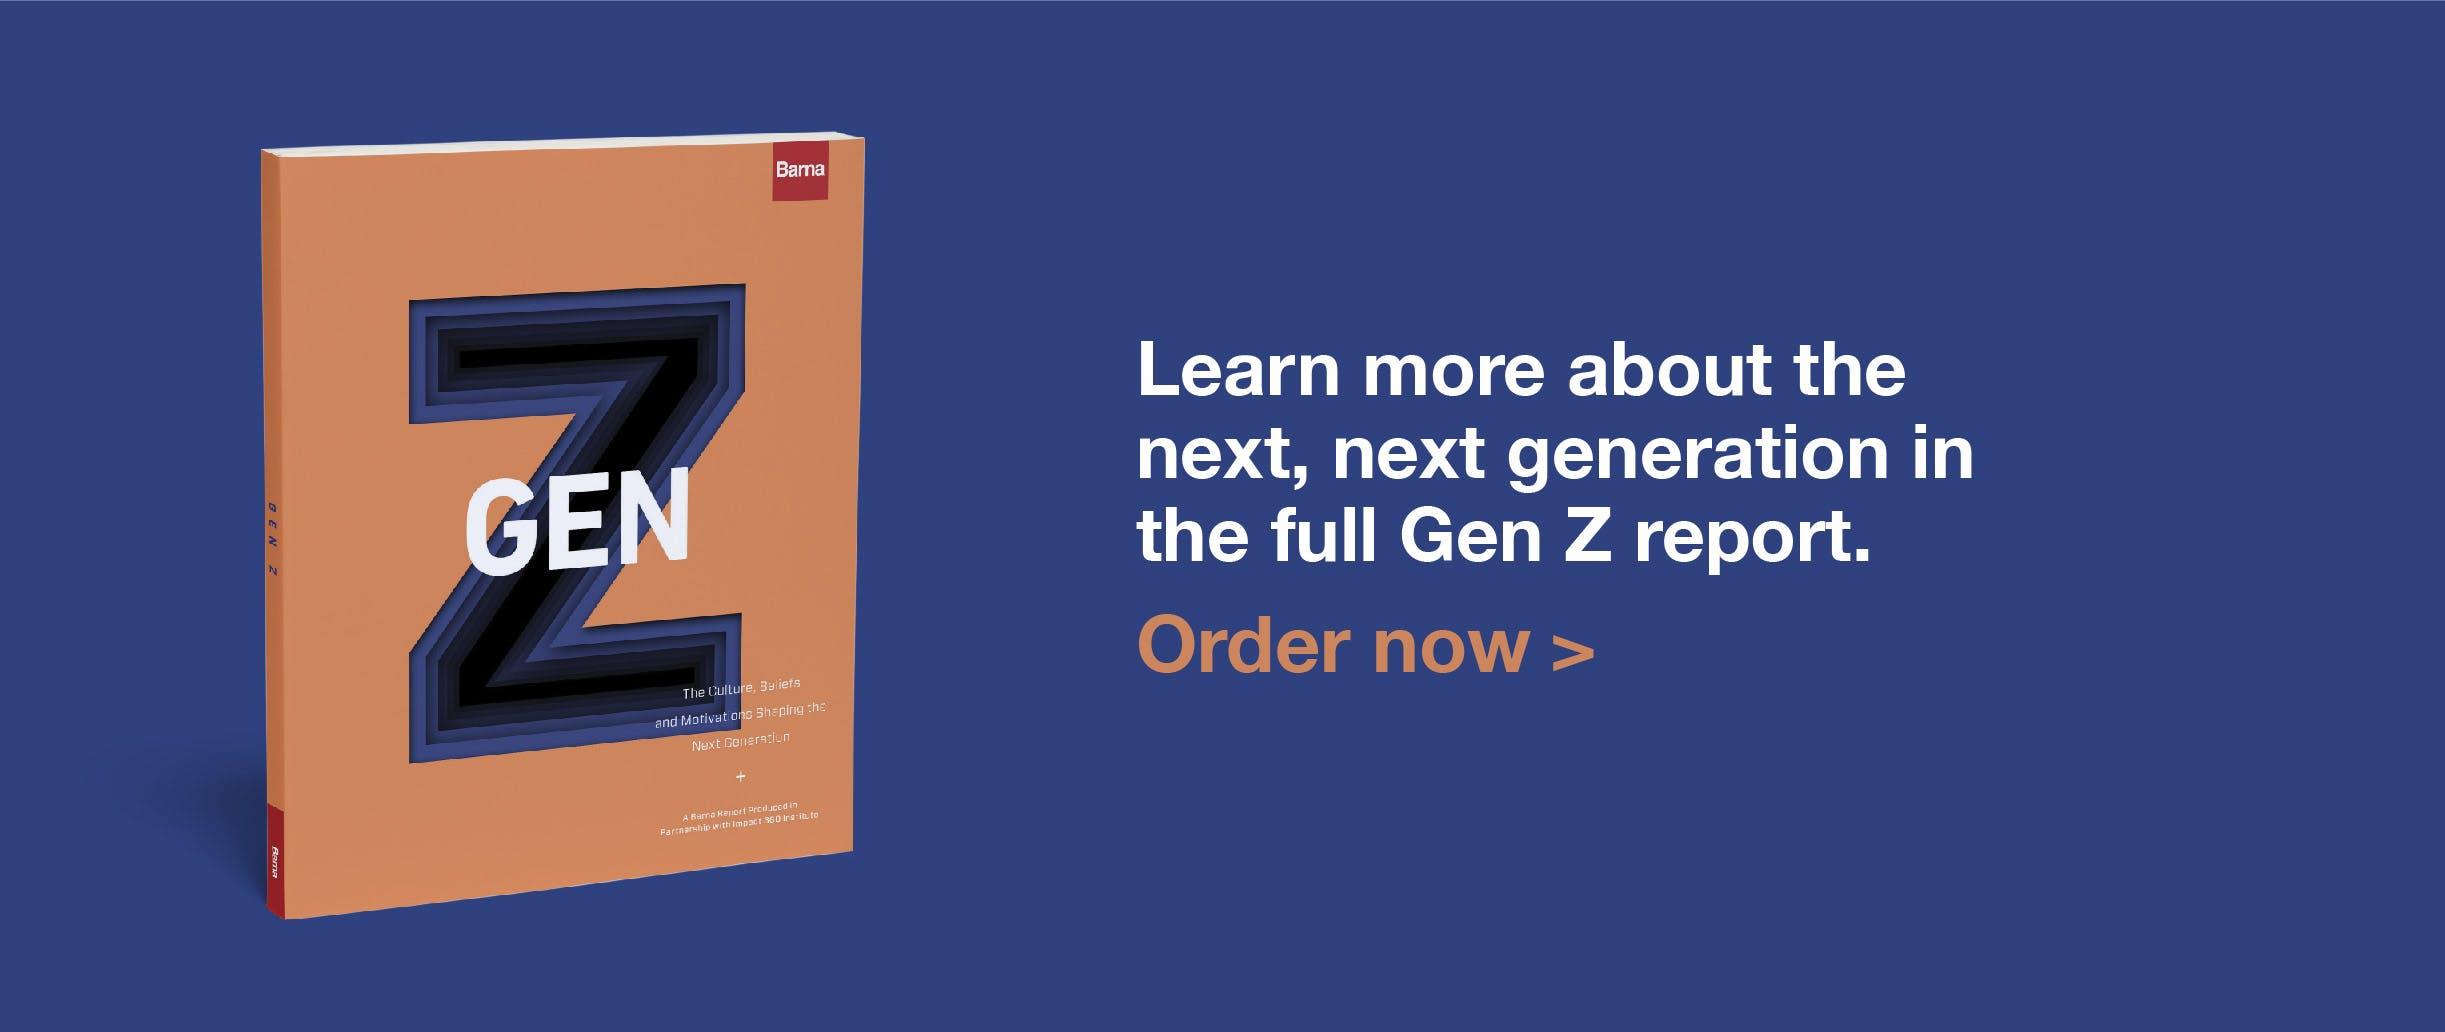 Generation Z ad